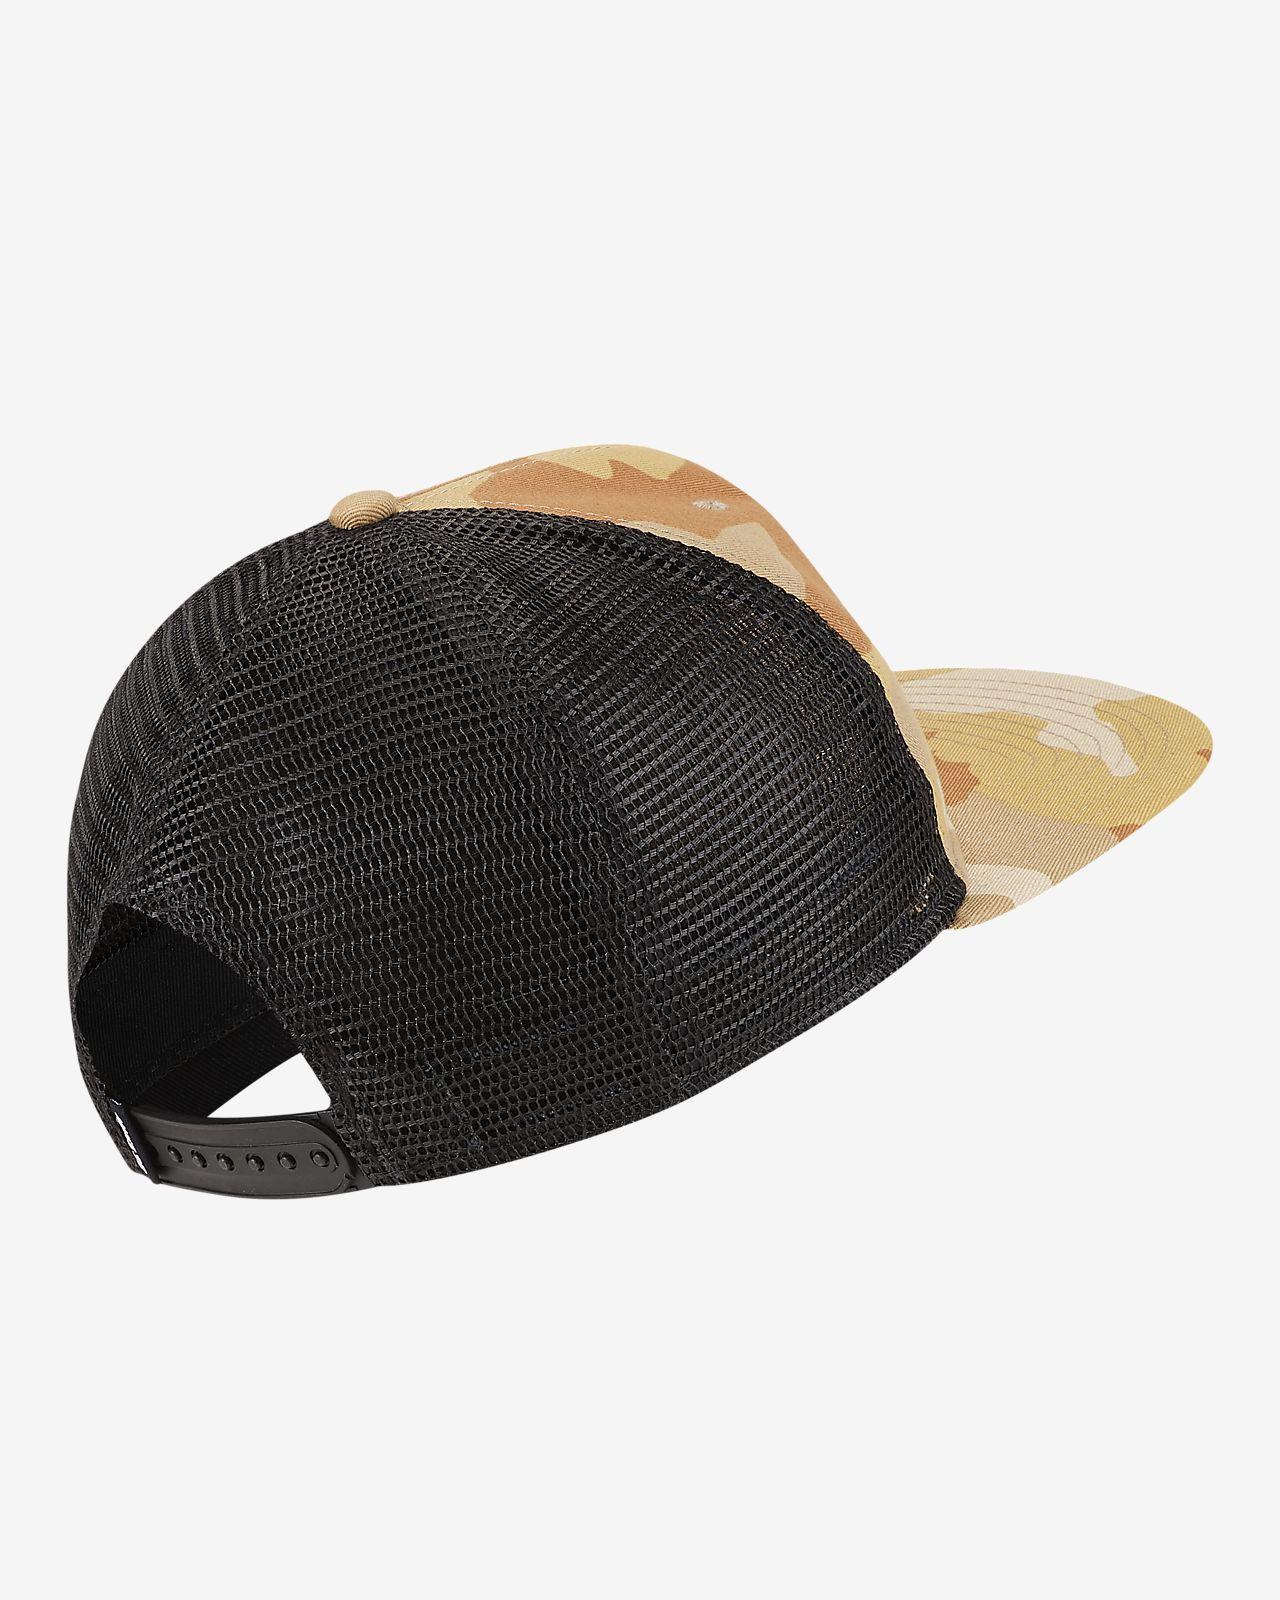 70c6eff4a158e4 Nike SB Skate Trucker Hat. Nike.com